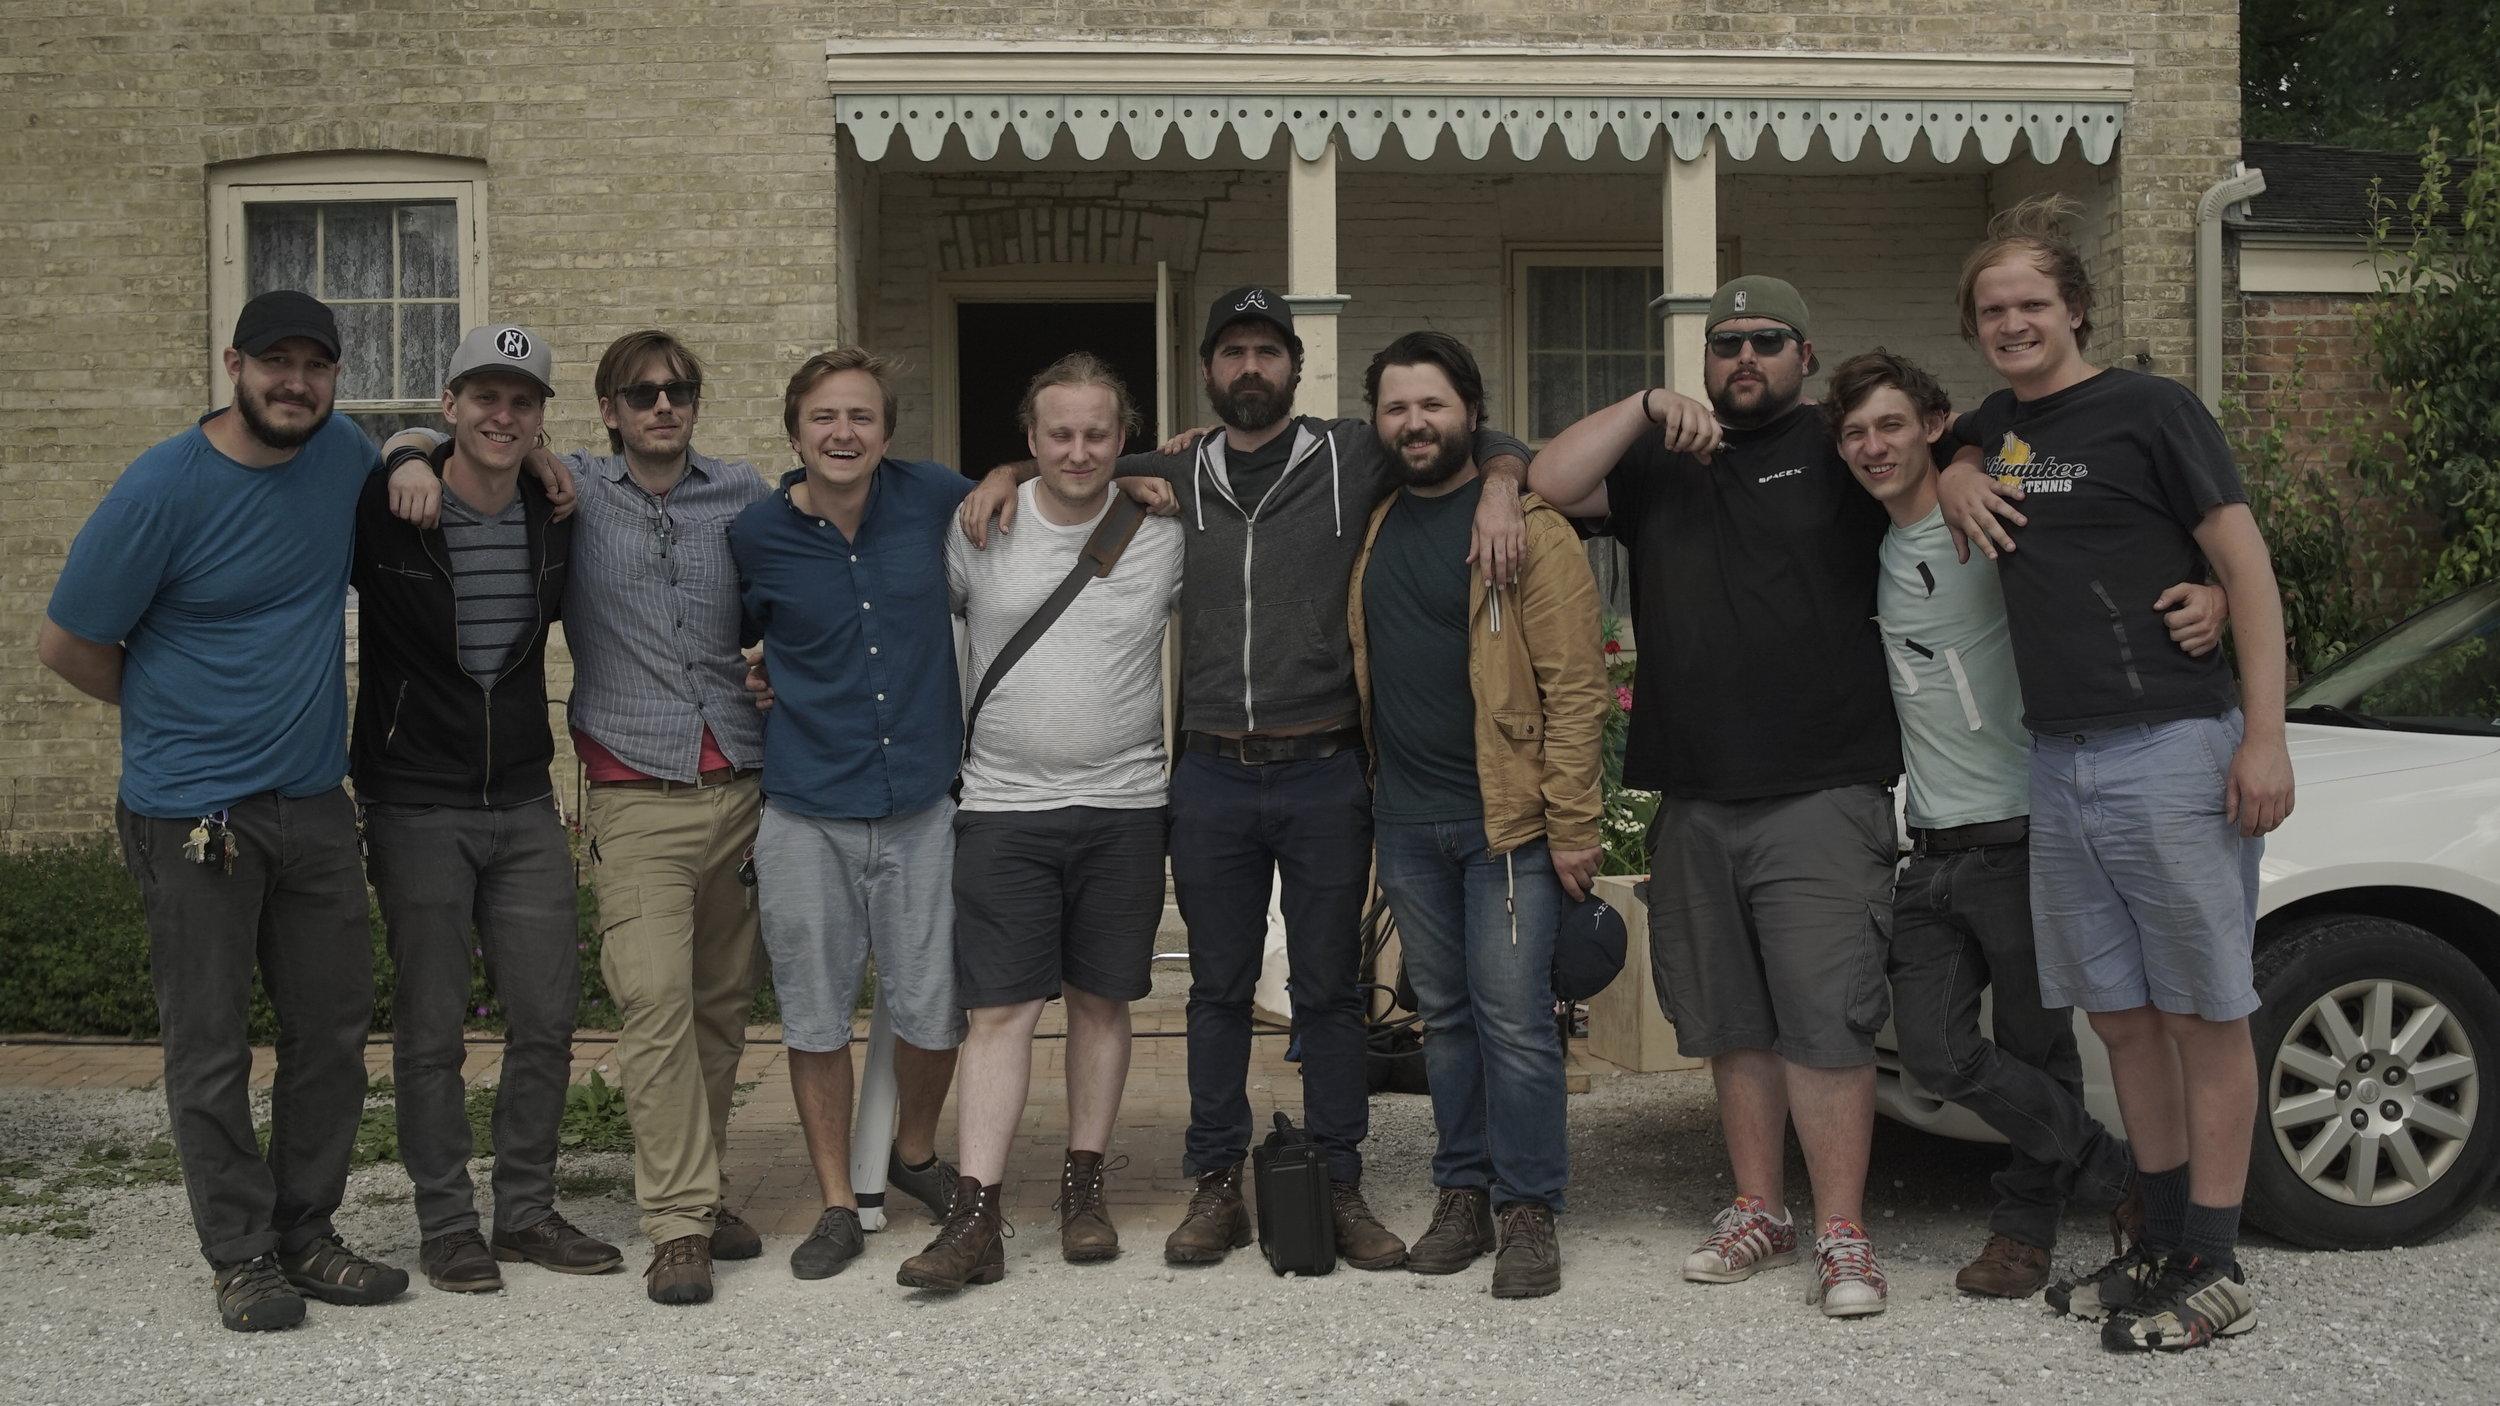 Crew of Mount Liptak